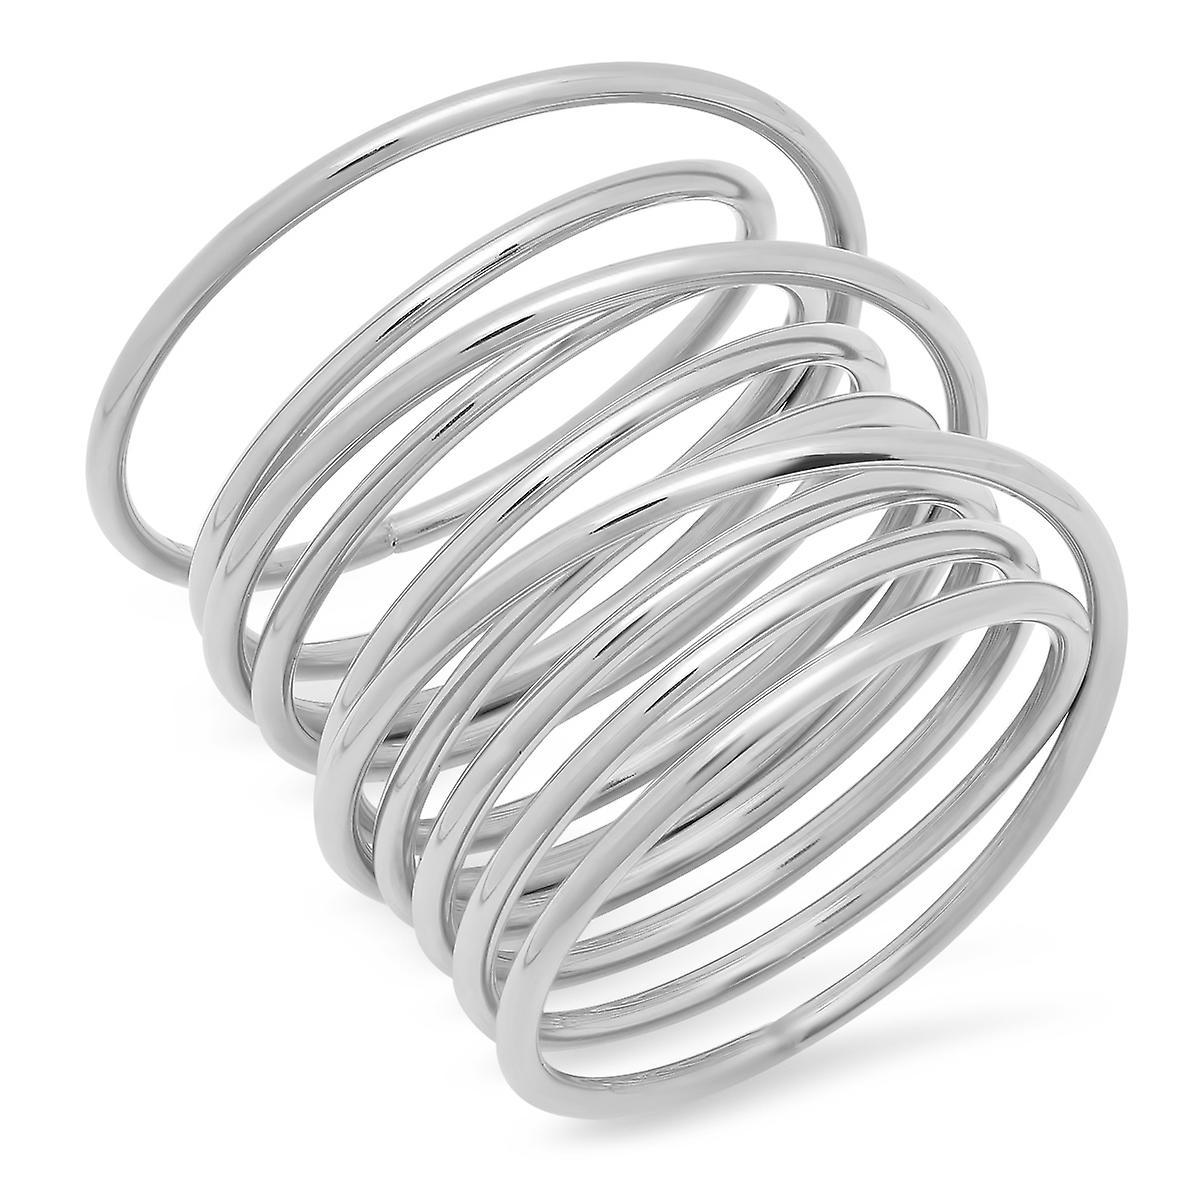 Ladies Stainless Steel Swirl Wrap Ring